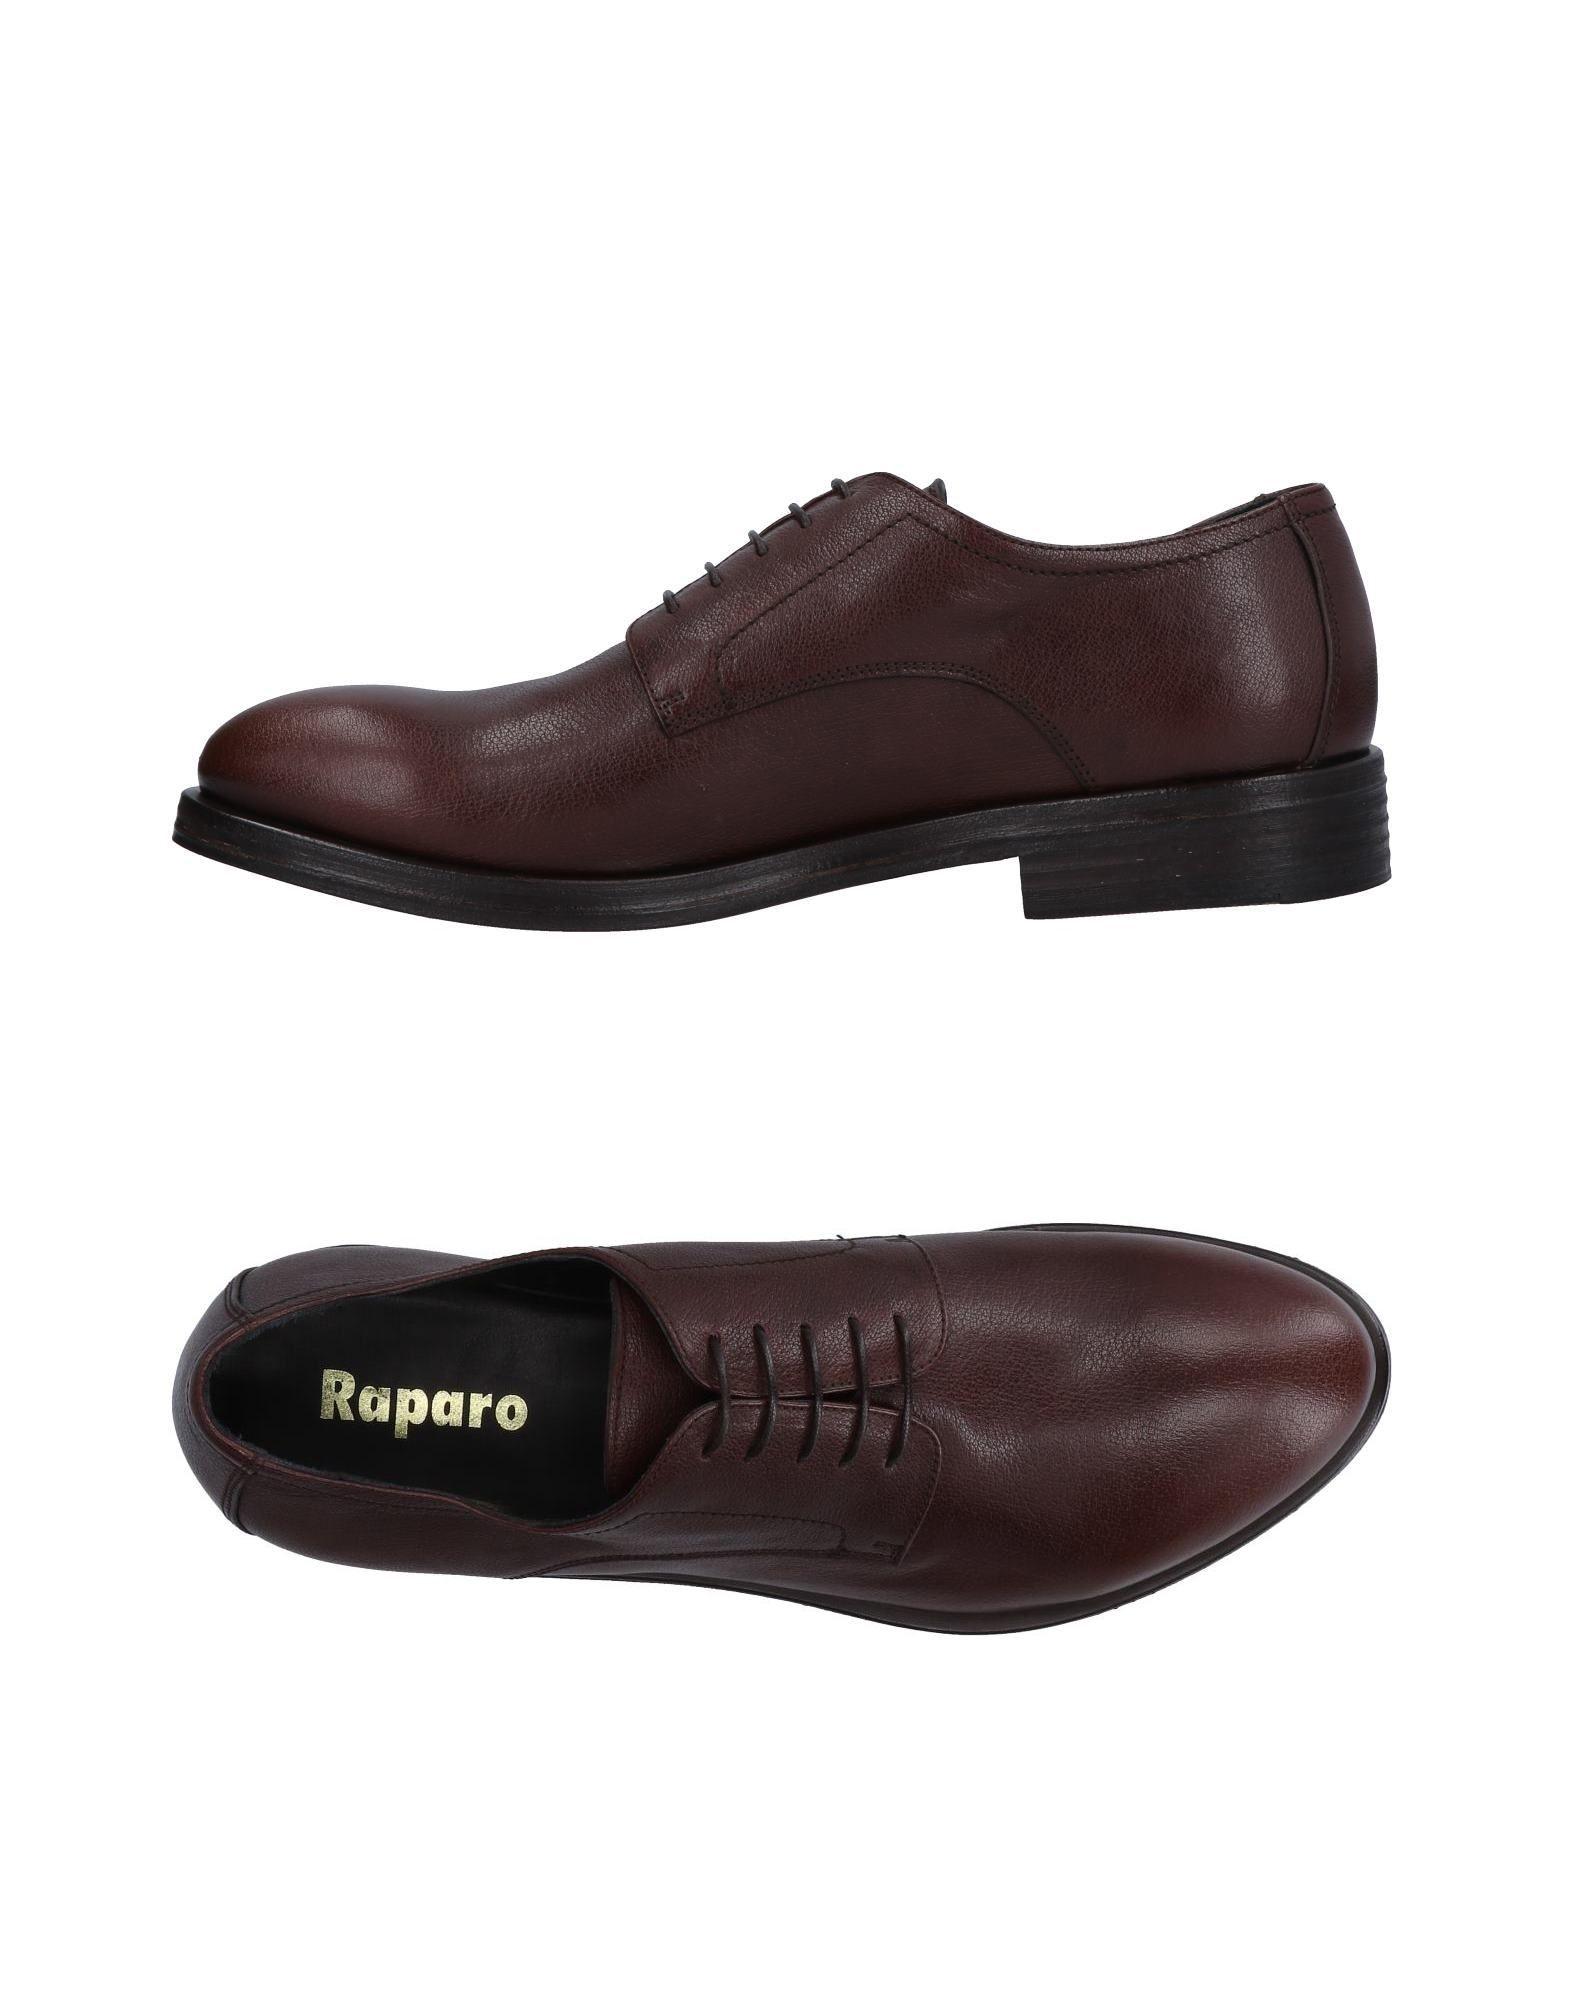 Фото - RAPARO Обувь на шнурках обувь на высокой платформе dkny